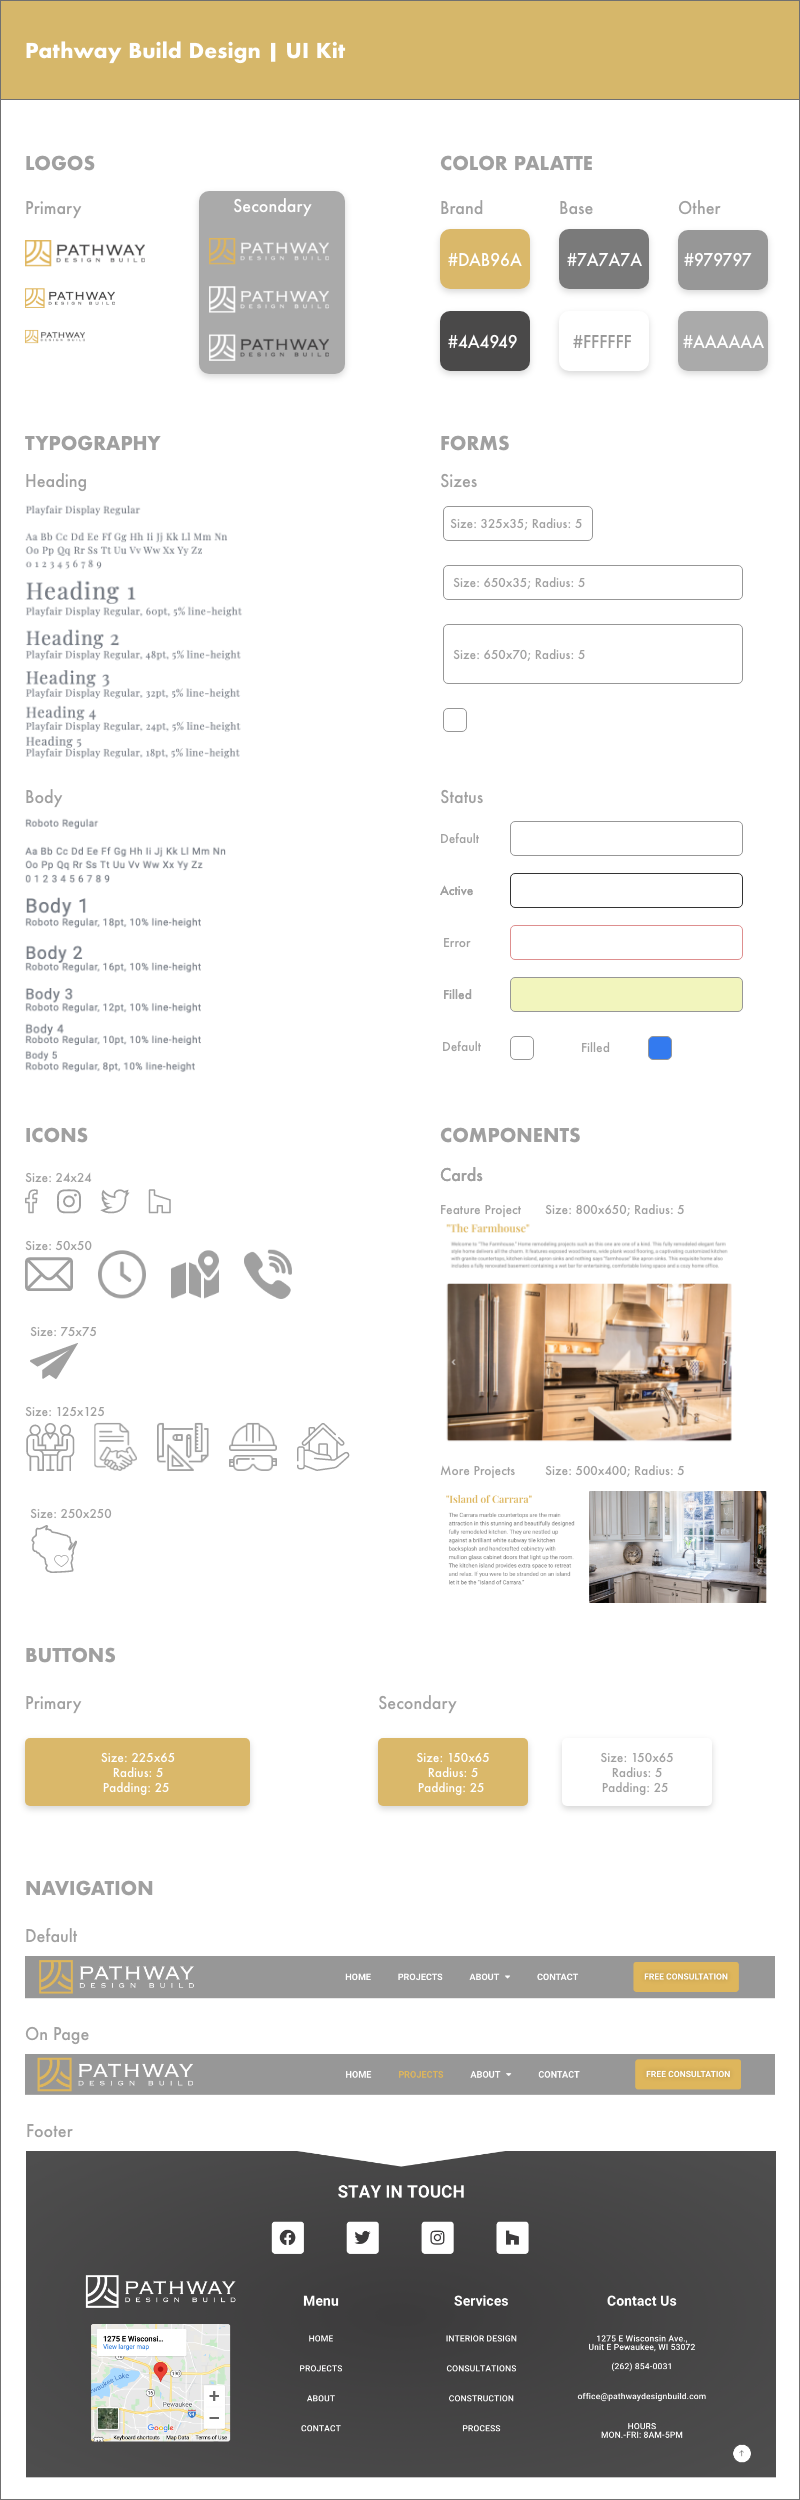 Pathway Design Build UI Kit